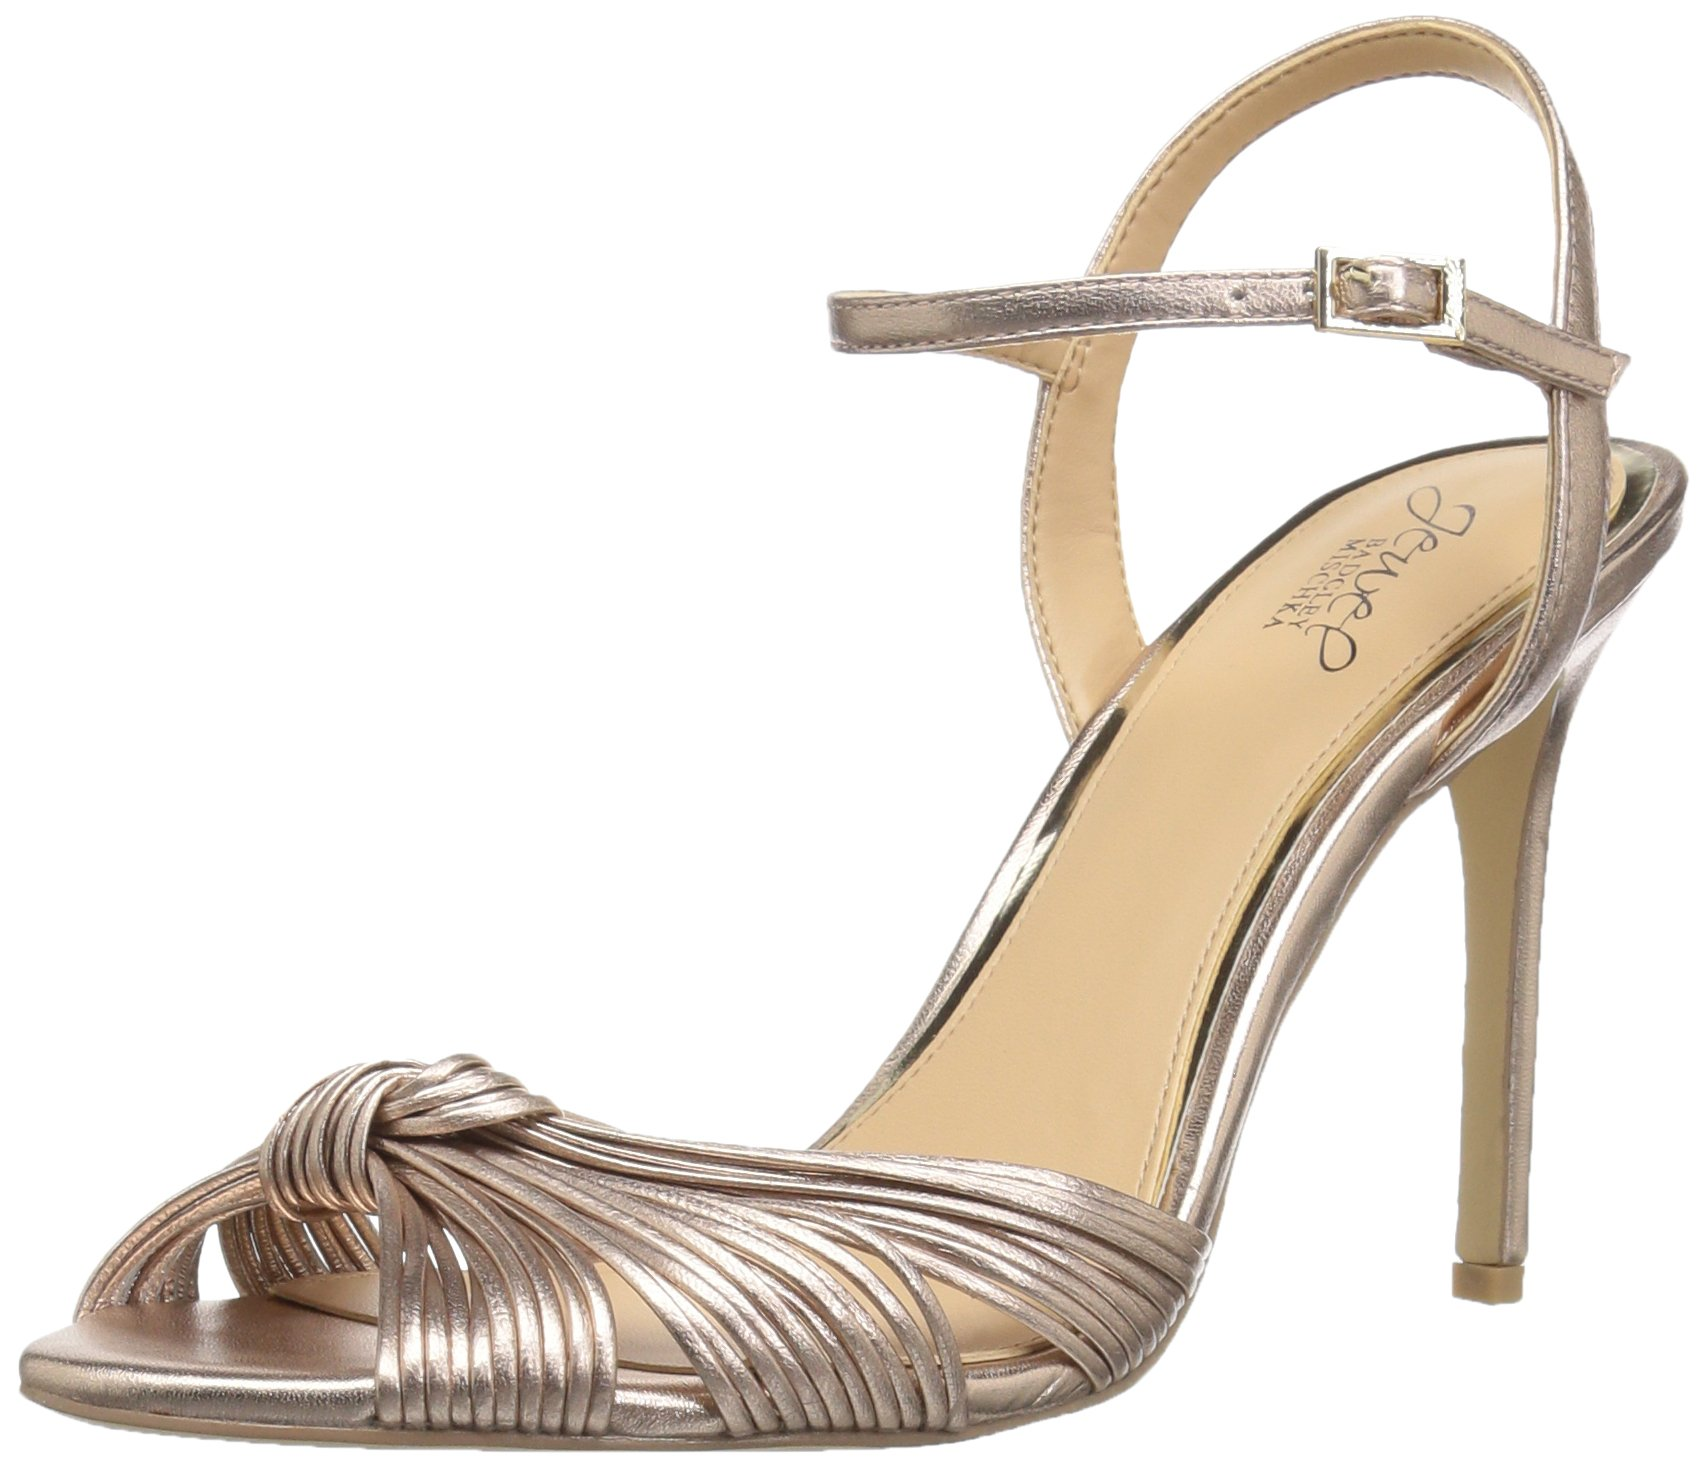 Jewel Badgley Mischka Women's Lady Heeled Sandal, Rose Gold, 10 Medium US